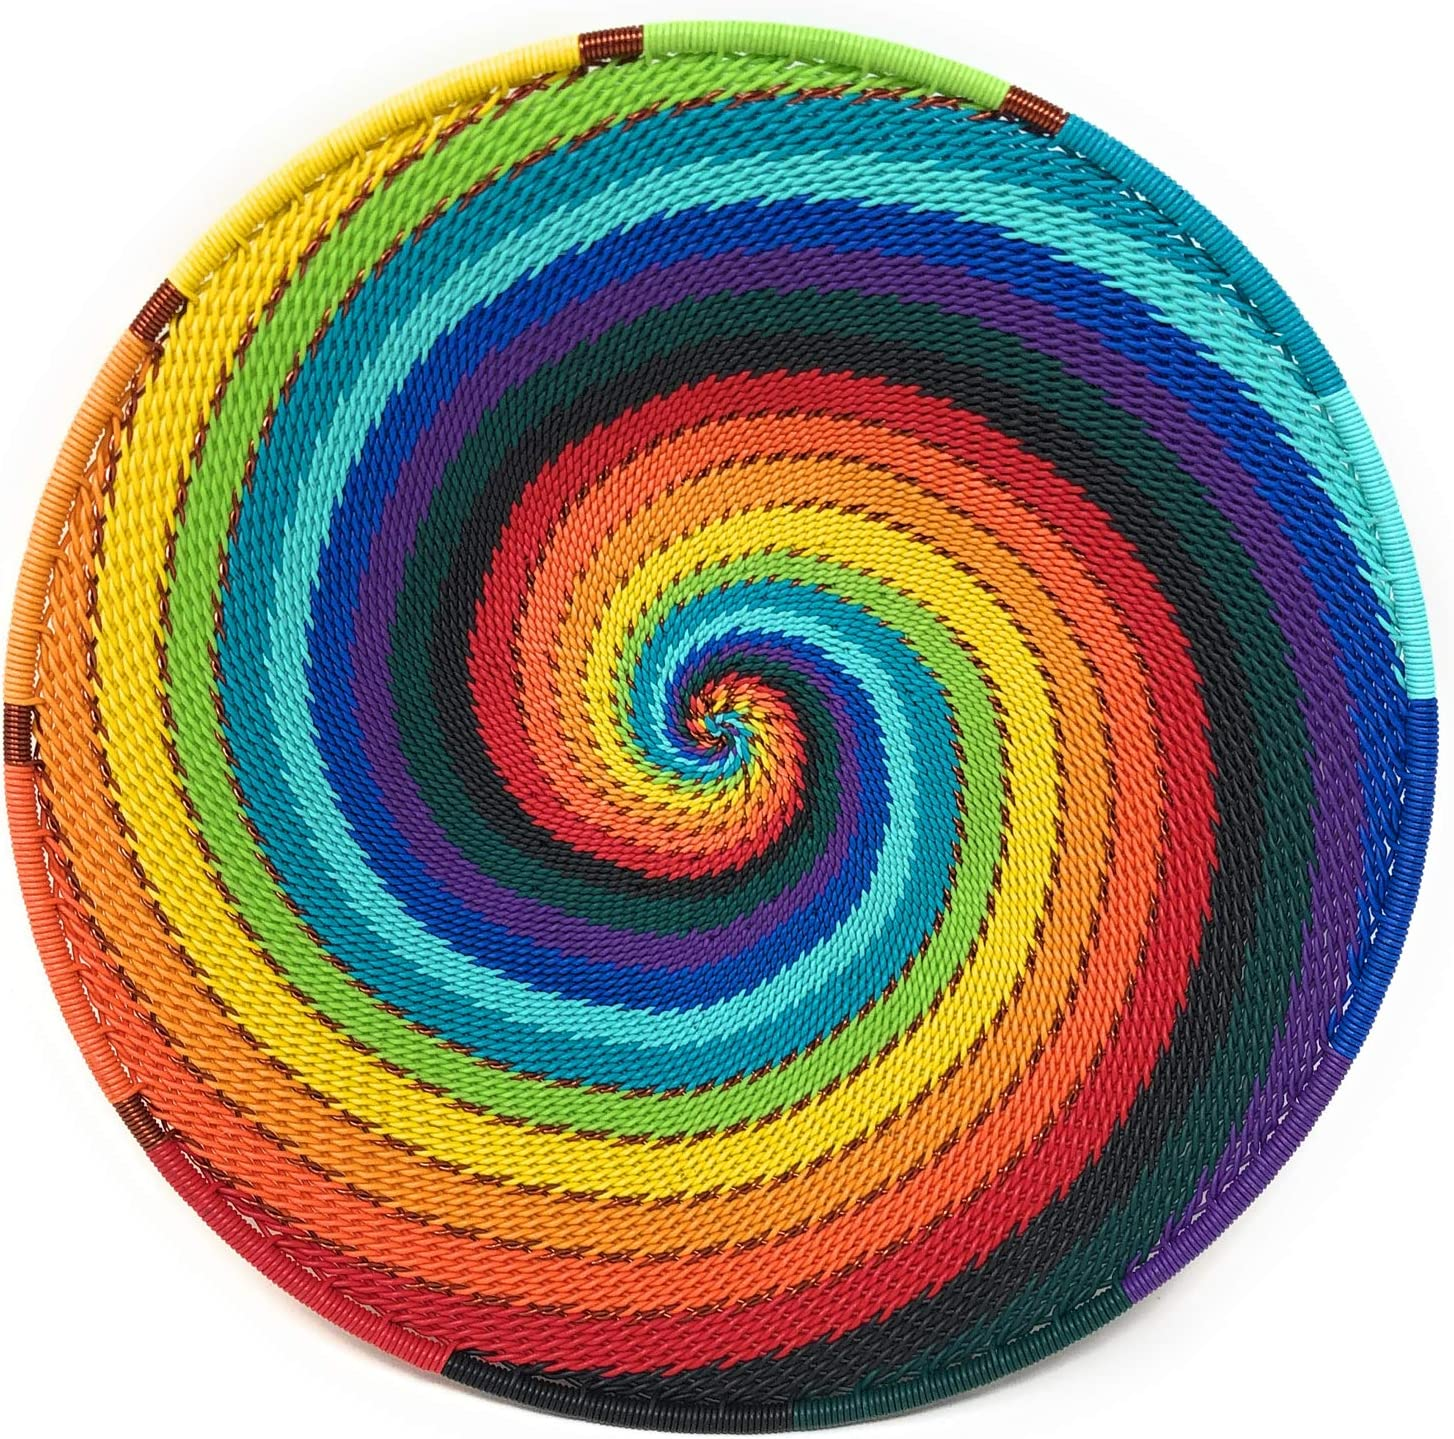 Bridge for Africa Fair Trade Zulu Telephone Wire 8-inch Platter Basket, African Rainbow